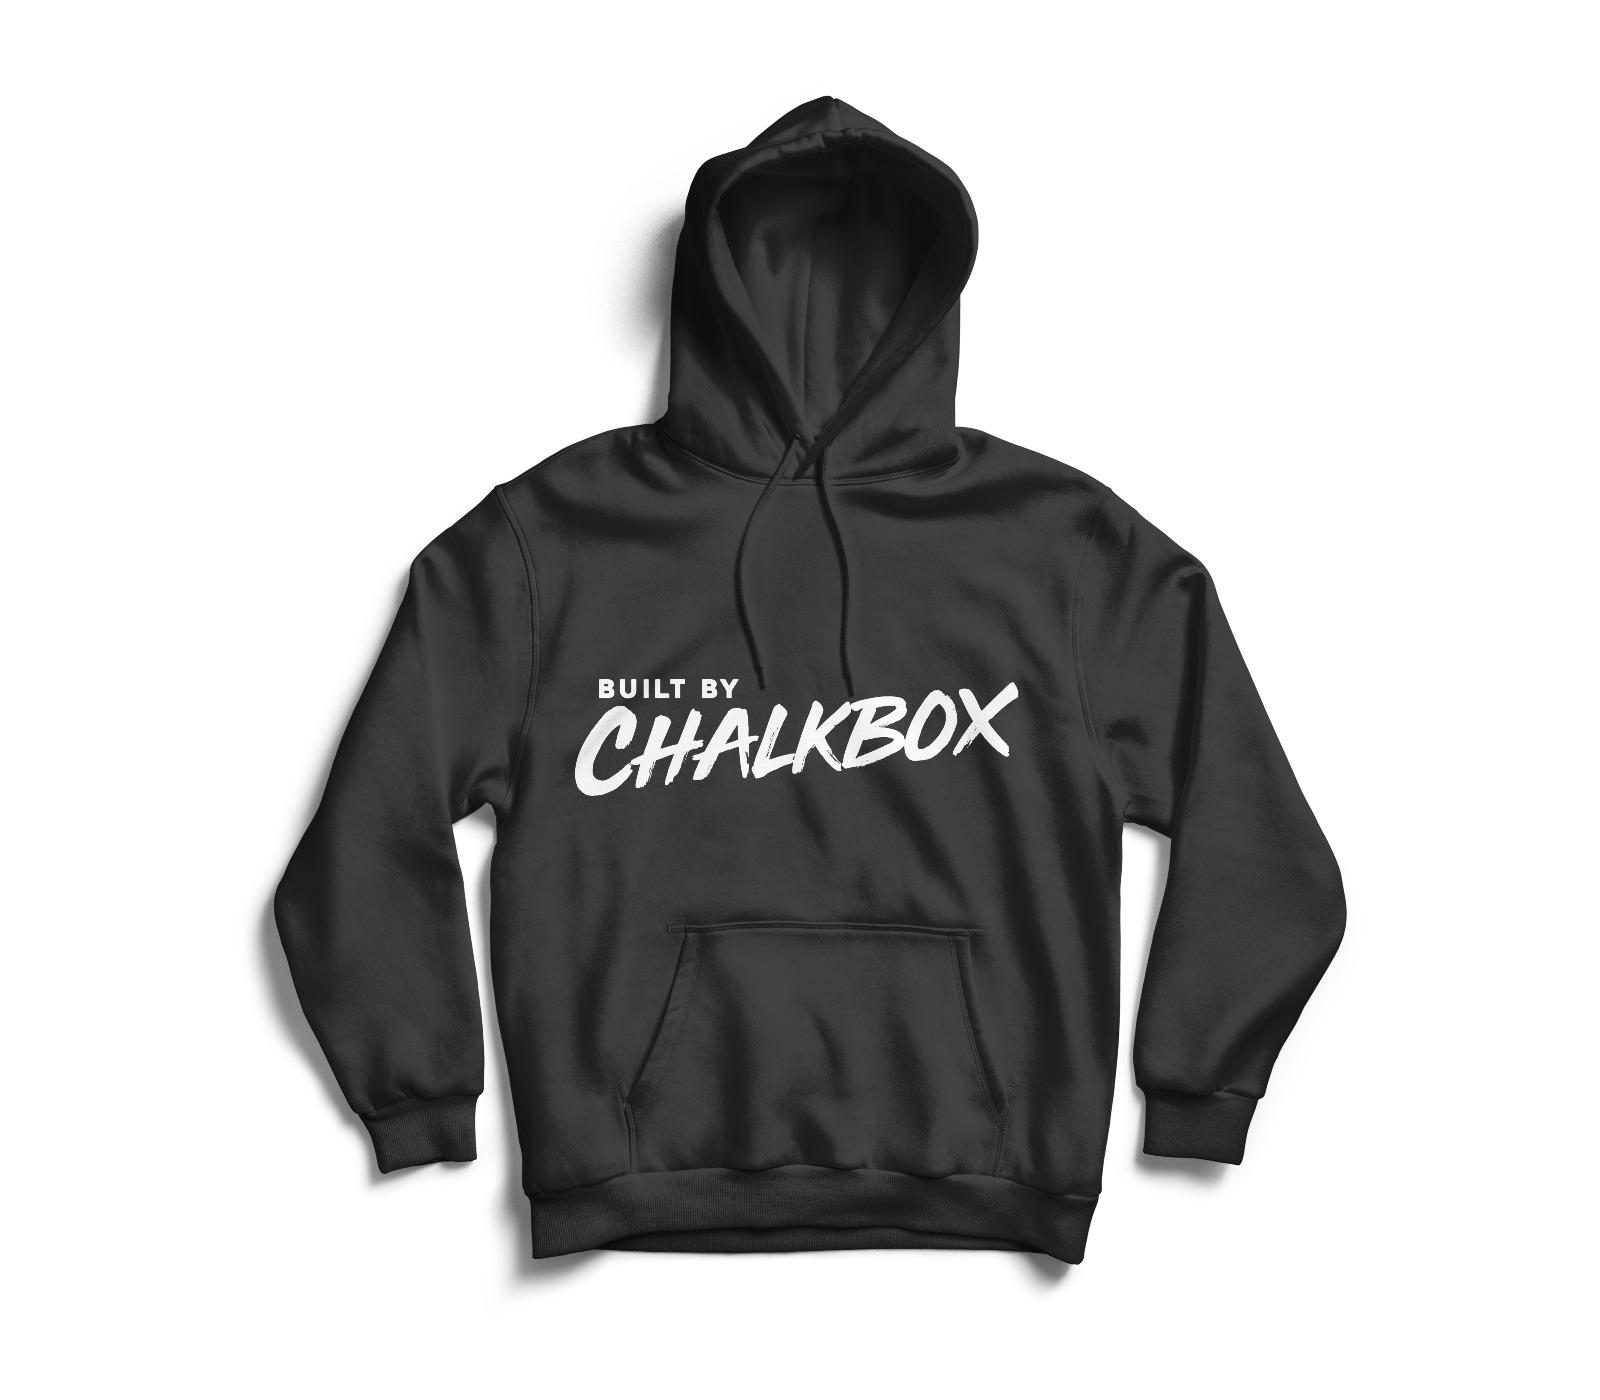 built_by_chalkbox_hoody_grey